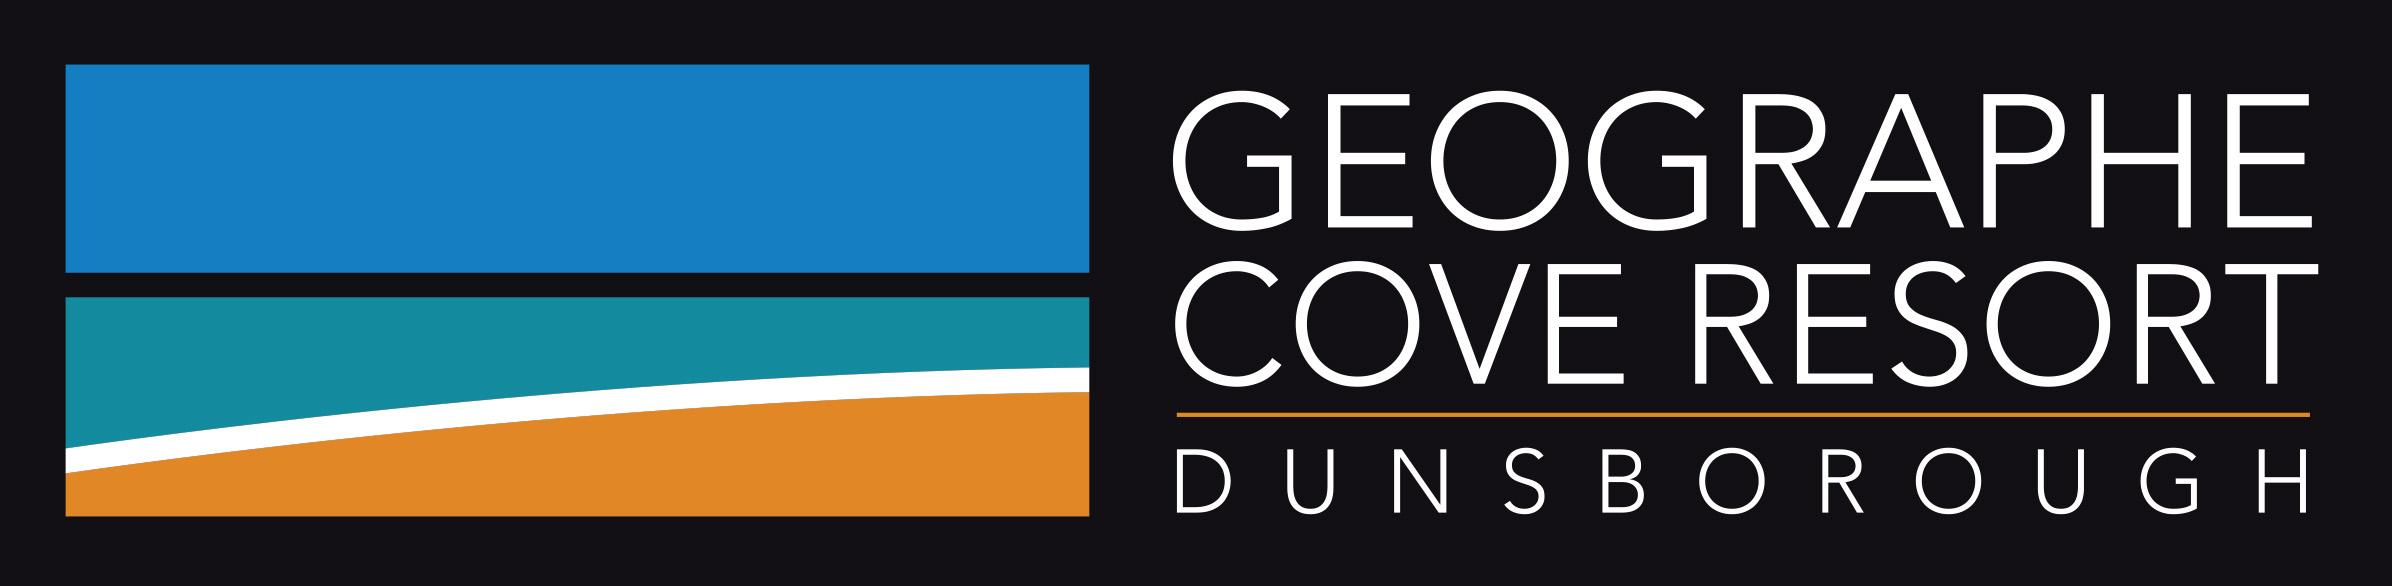 Geographe Cove Logo.jpg